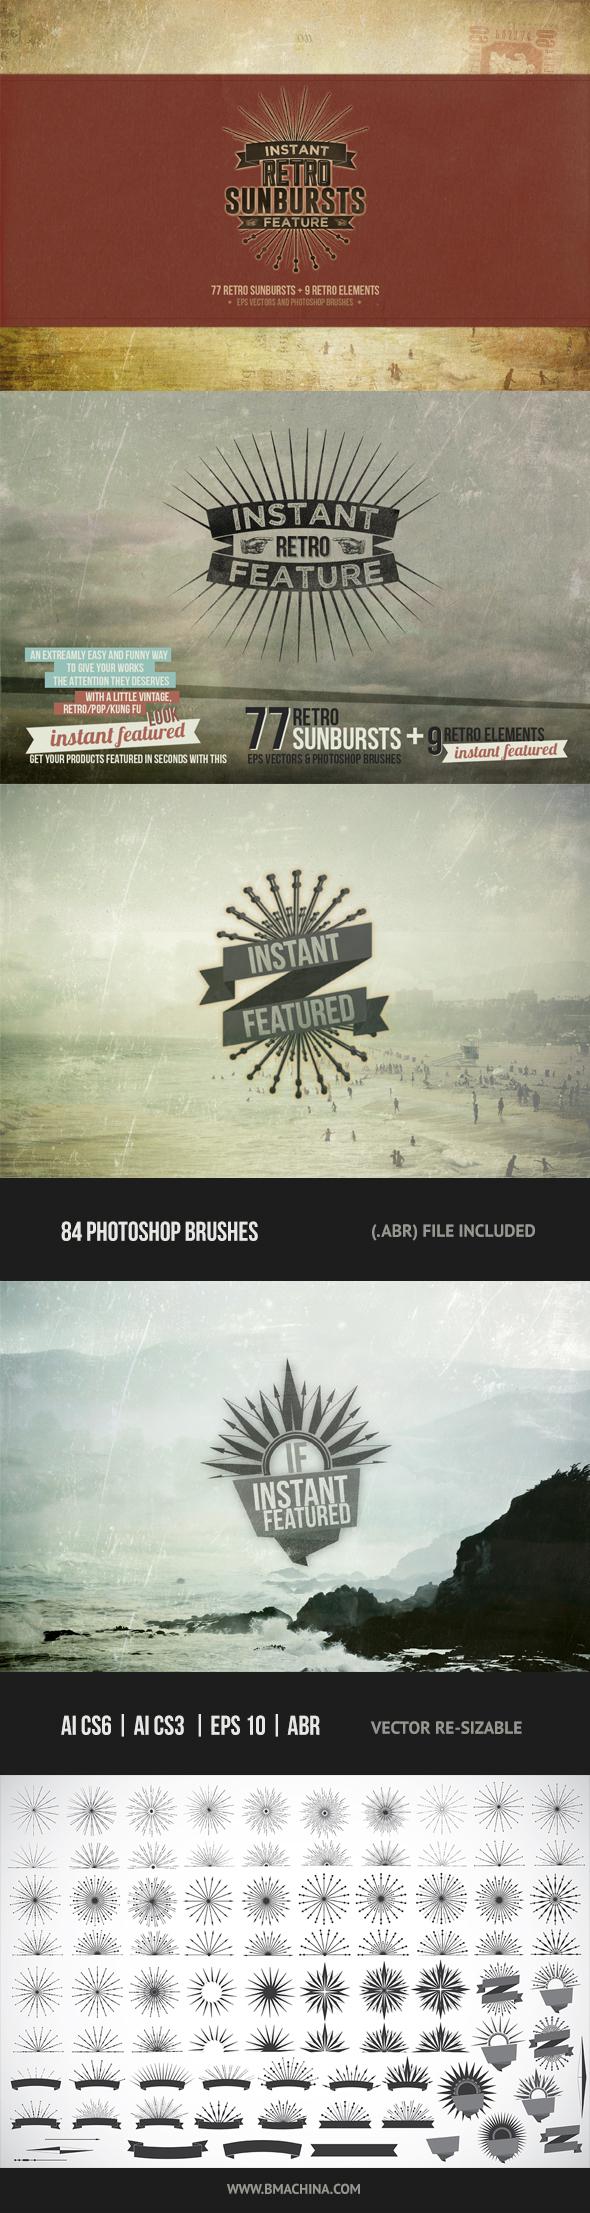 Instant Featured - 77 Retro Sunbursts - Brushes Photoshop